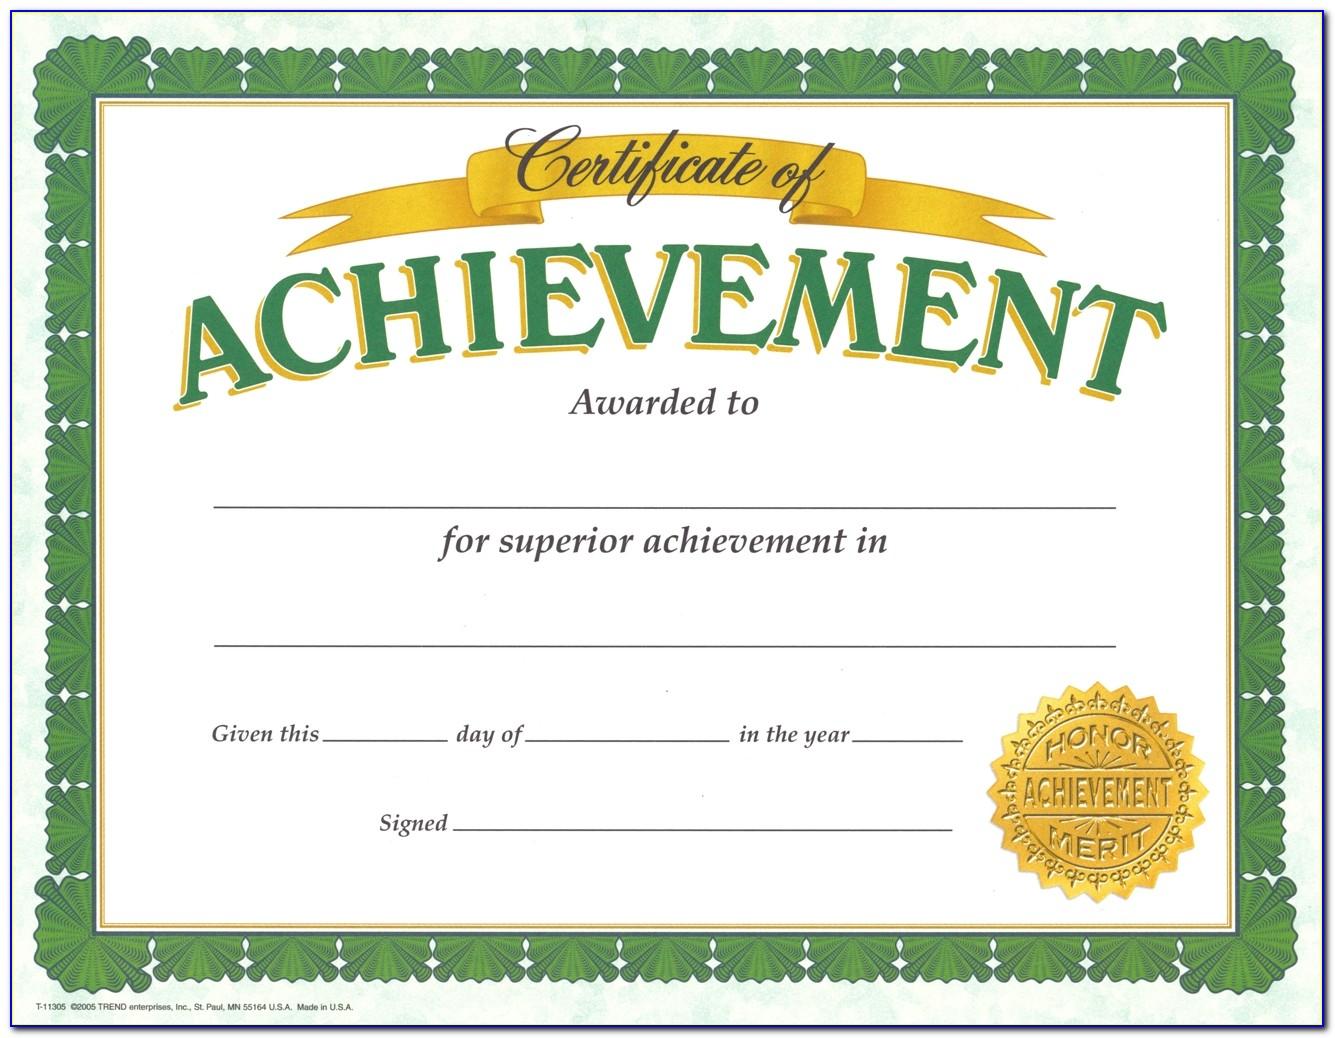 Achievement Award Certificate Templates Free